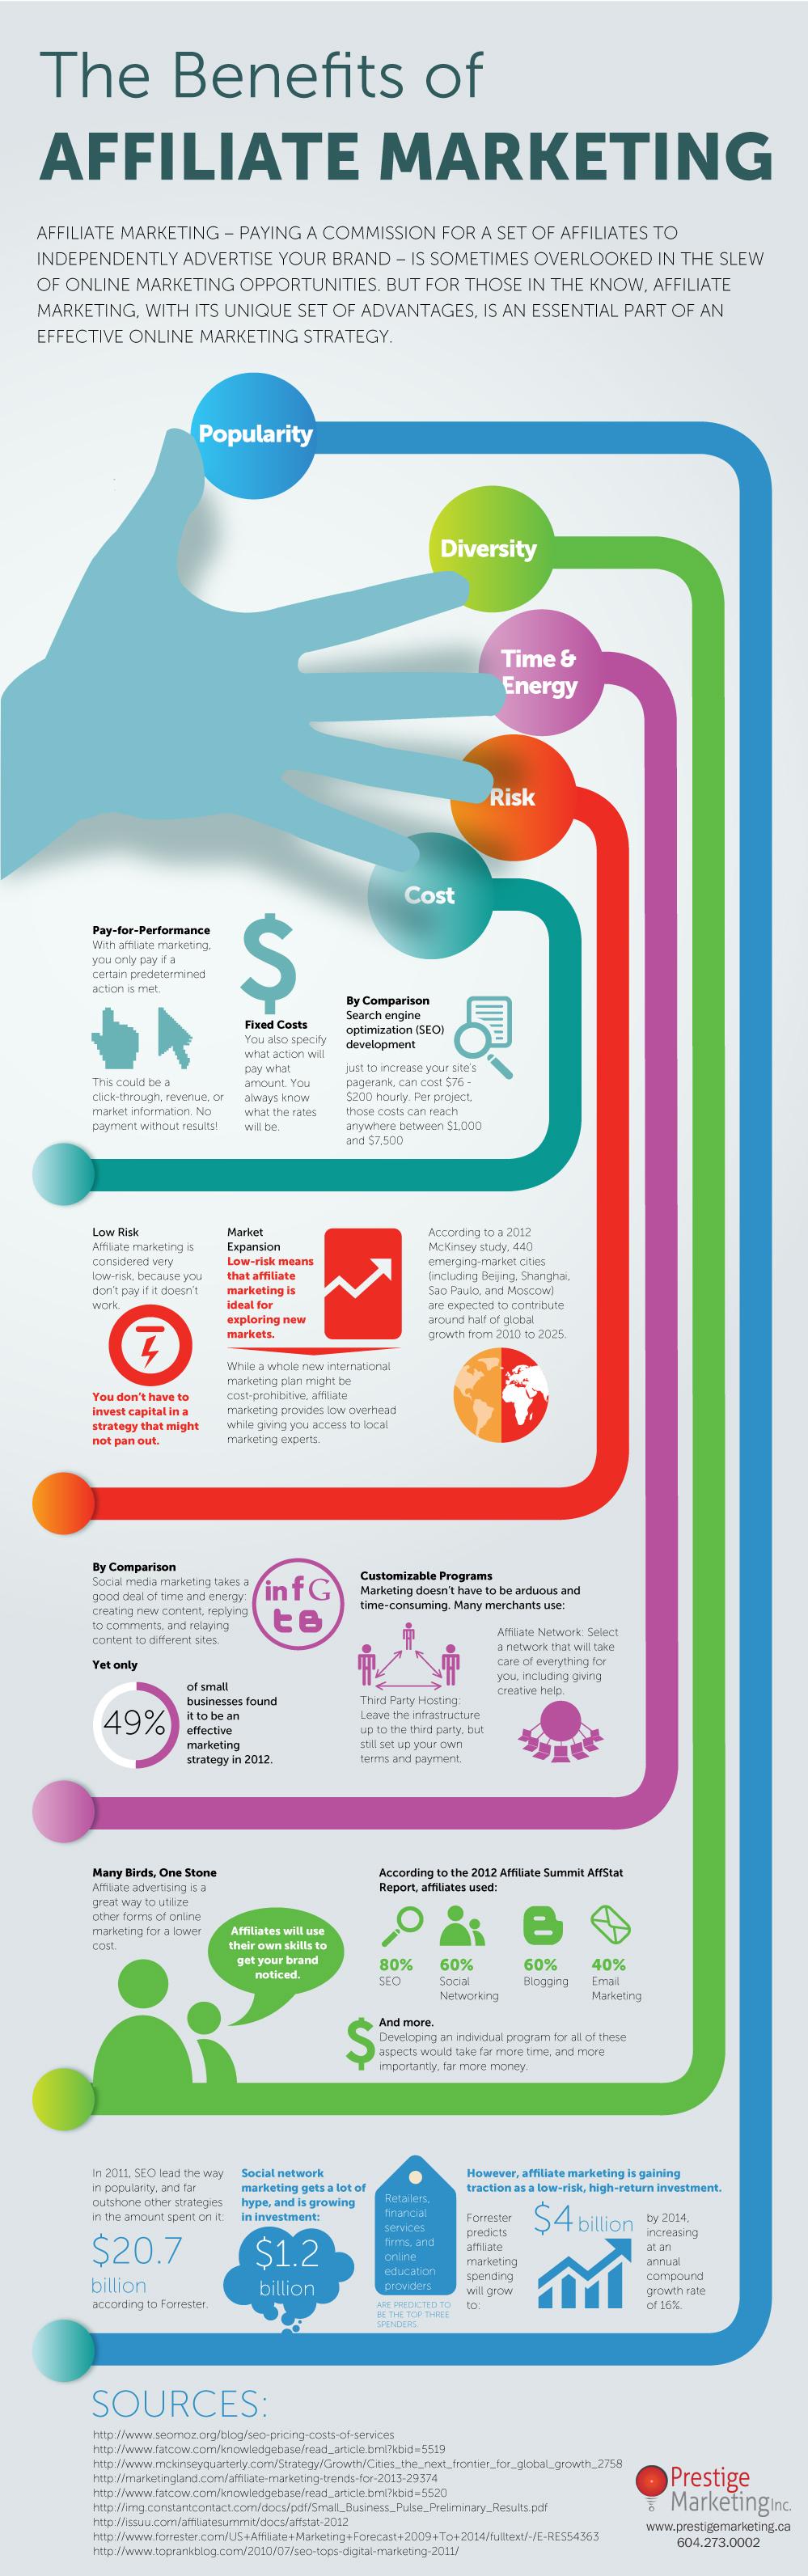 Benefits of Affilitate Marketing